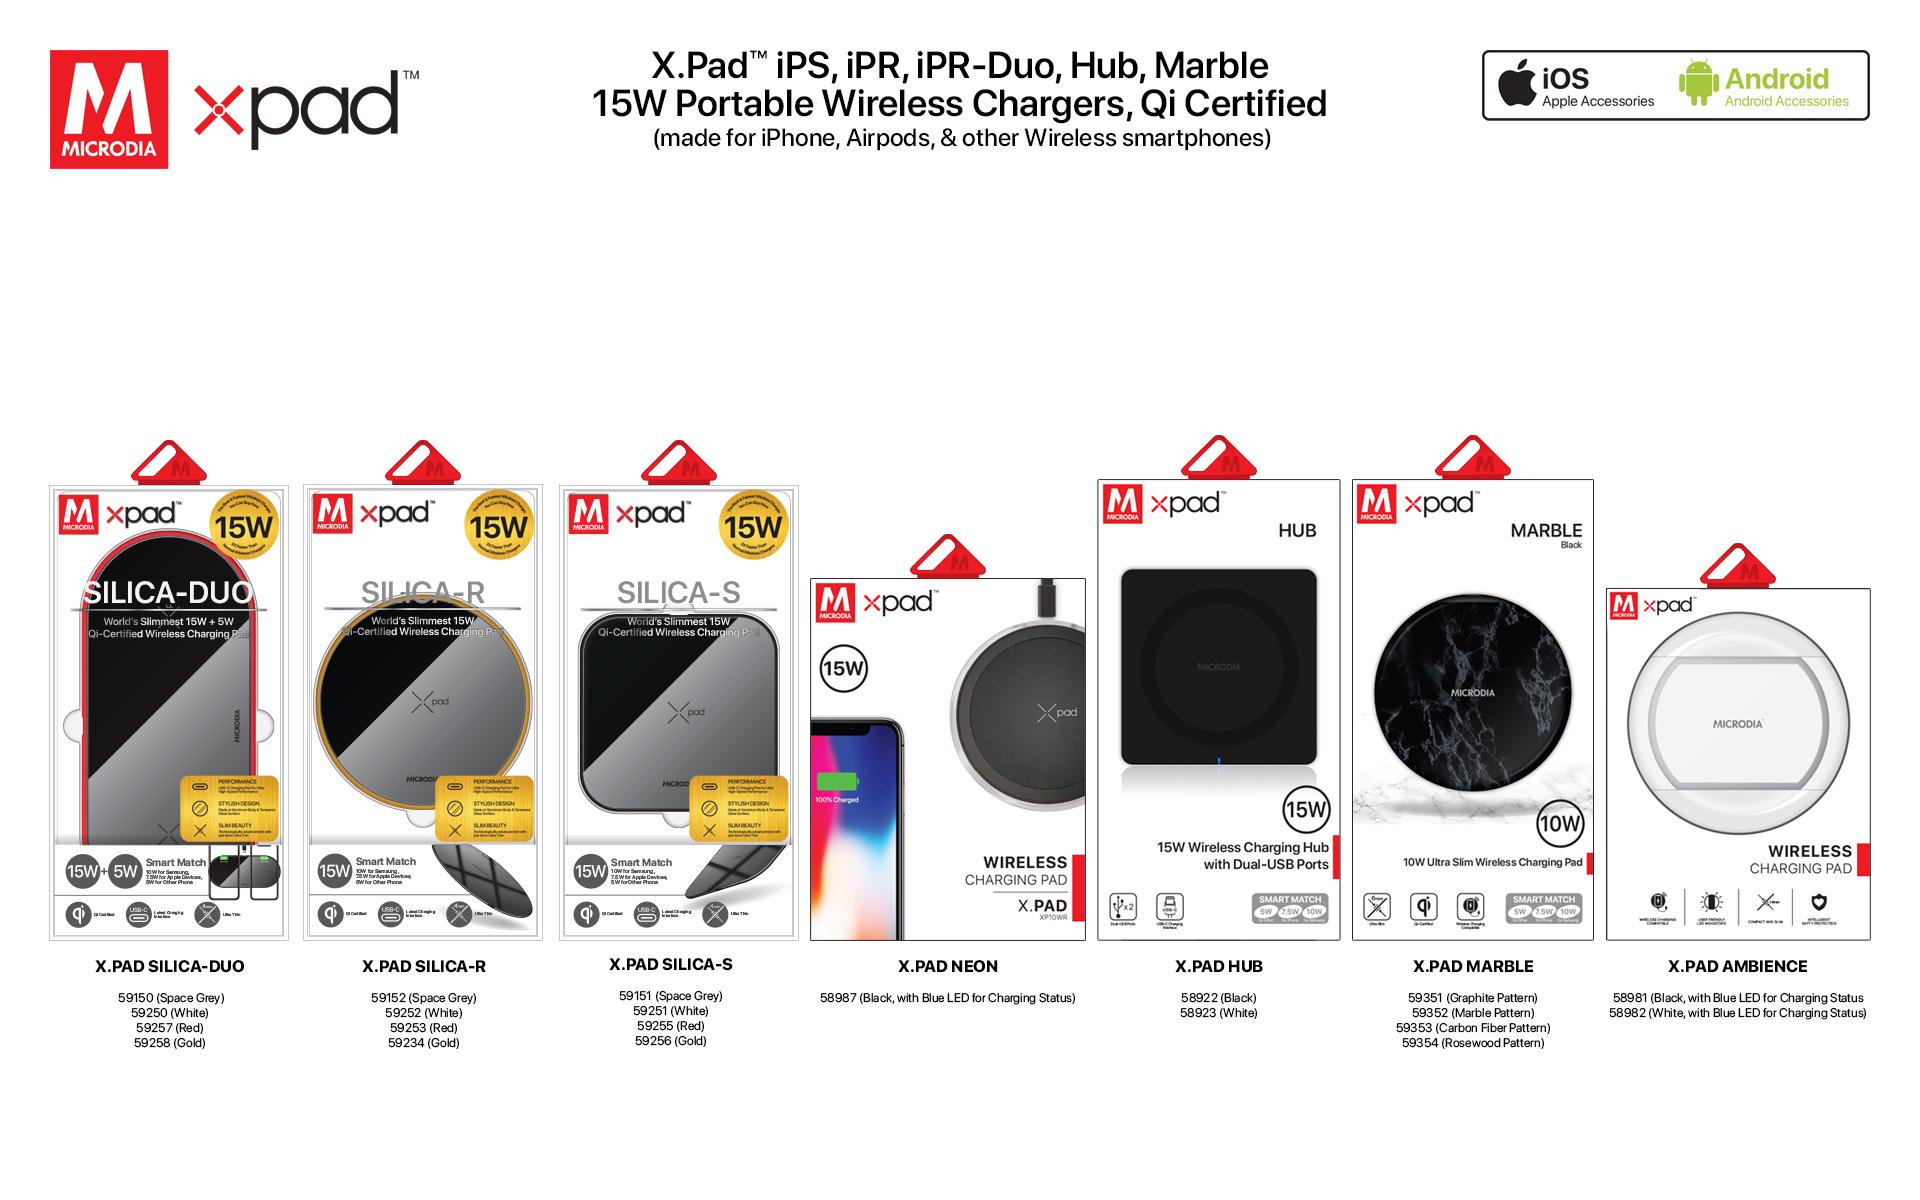 17. X.PAD Wireless Charging Pad